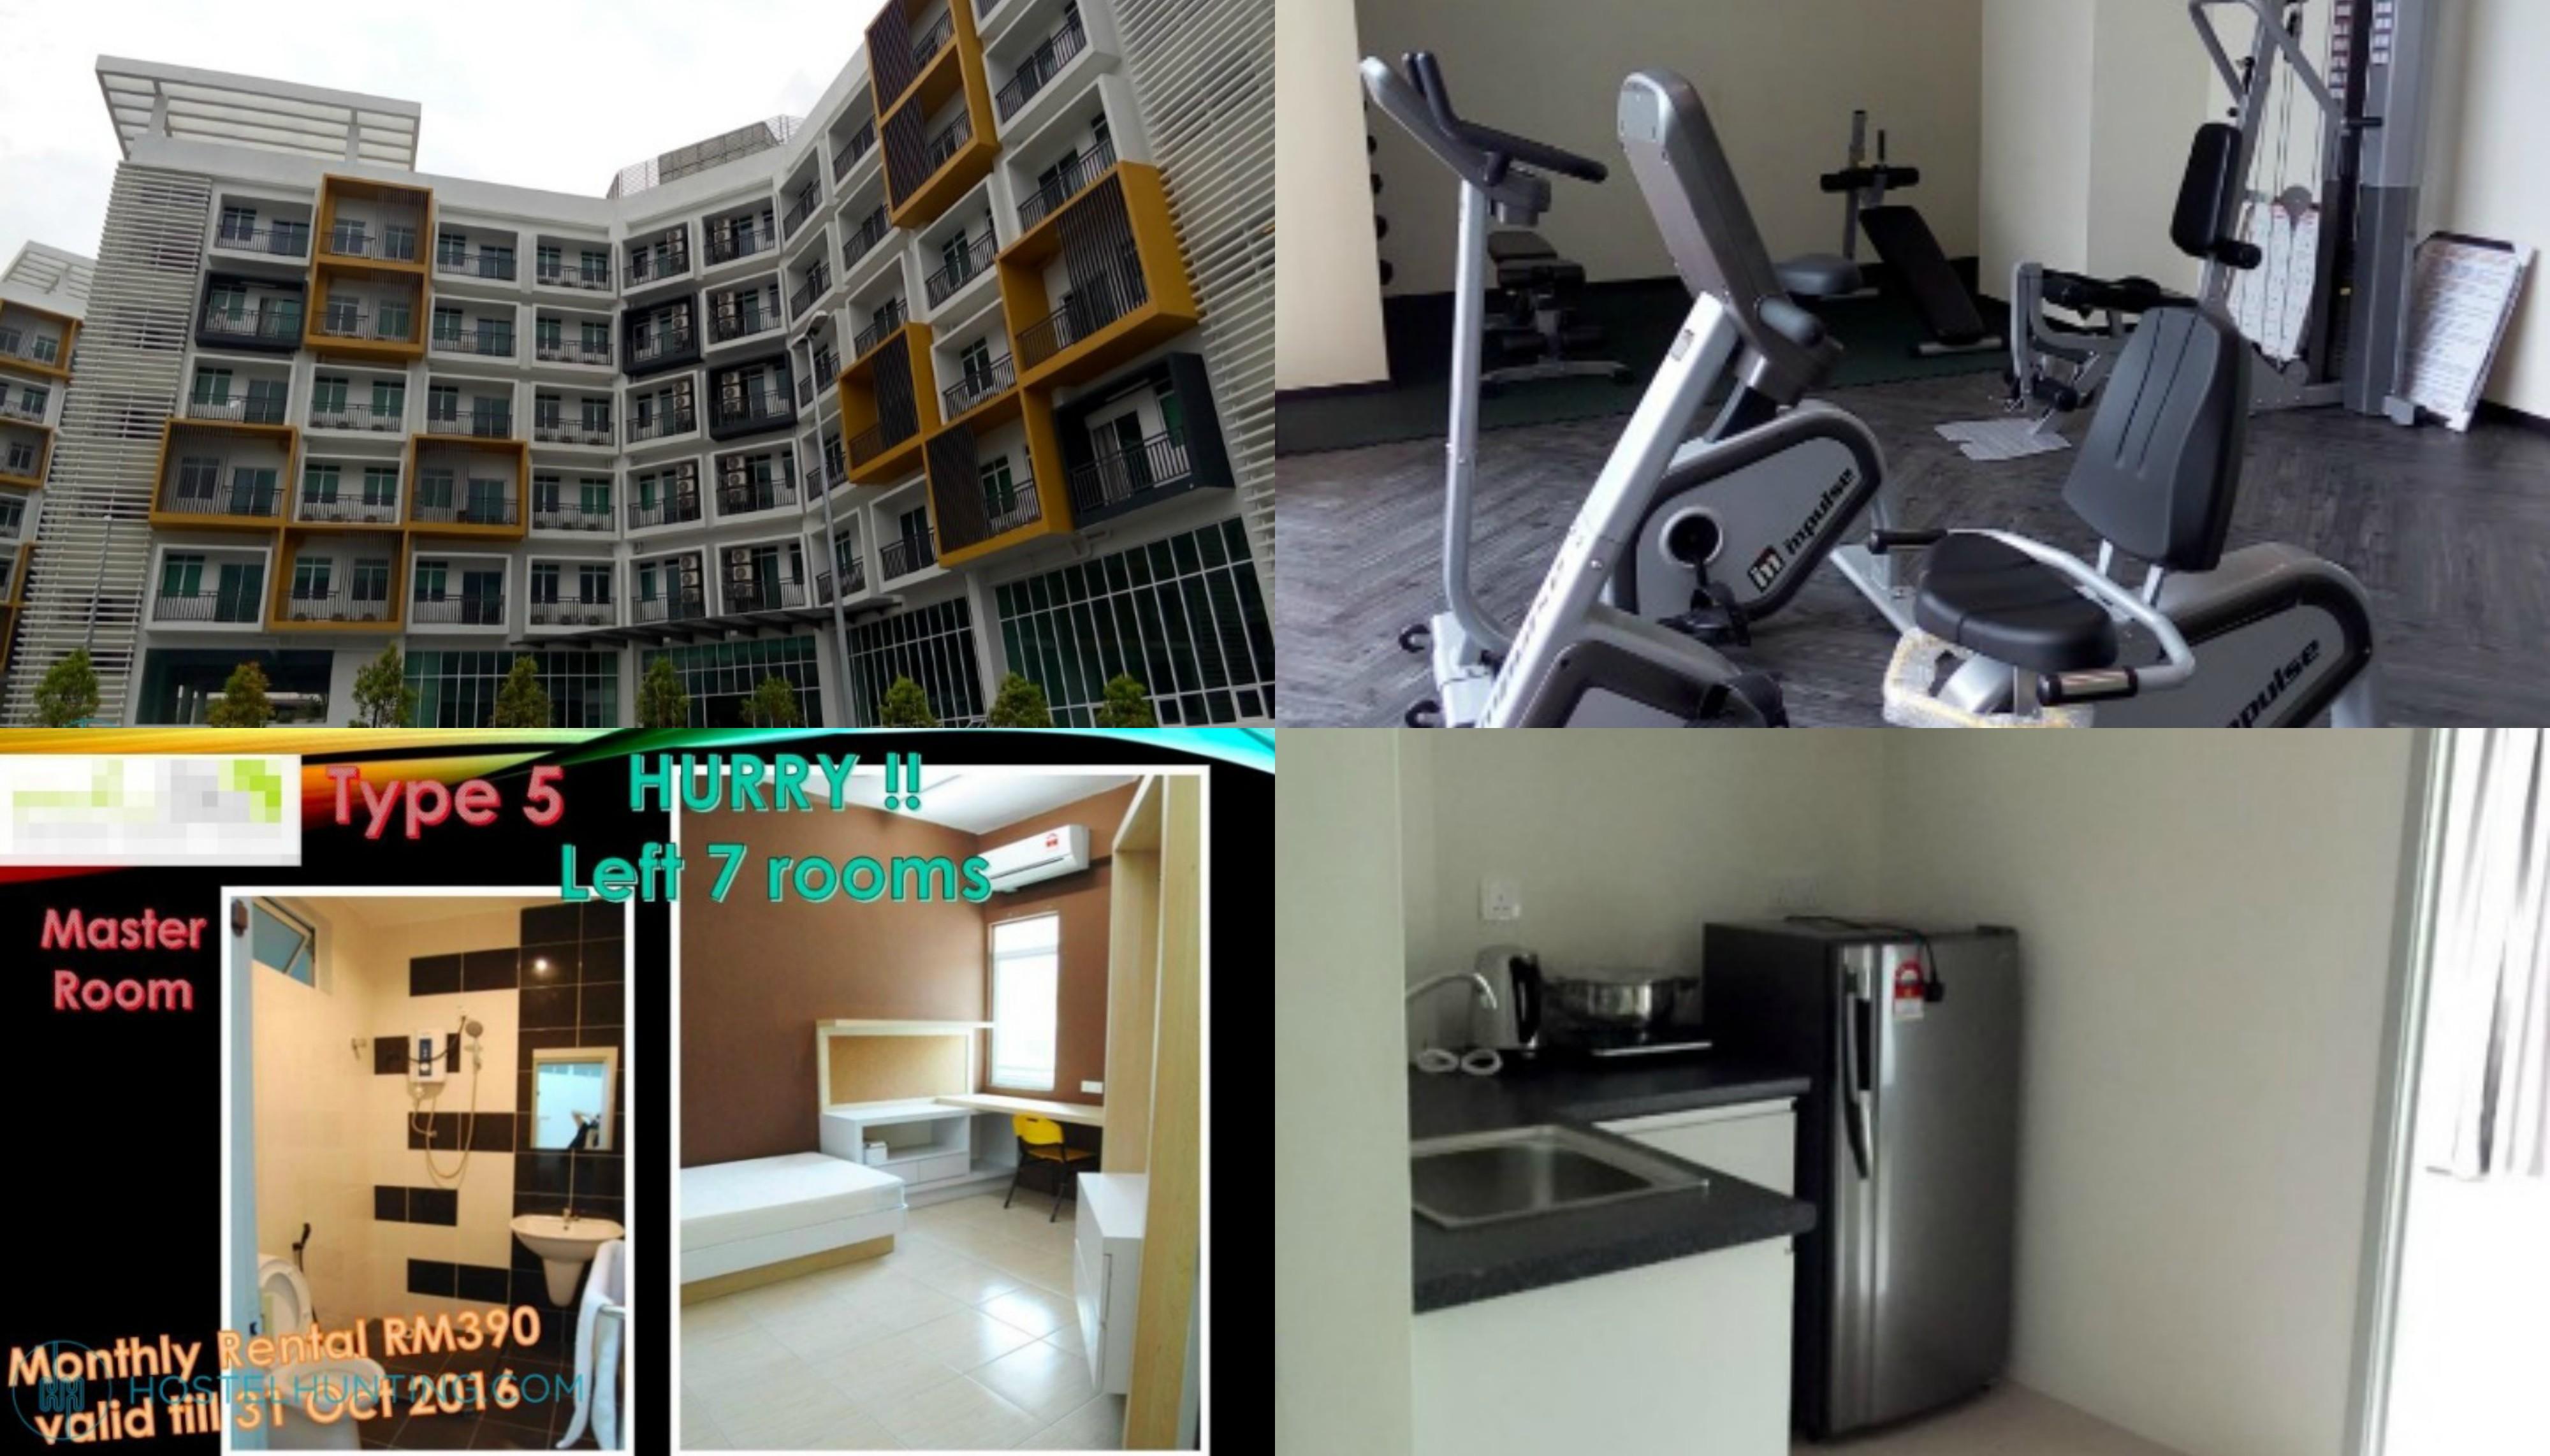 mh-unilodge kampar students accommodation hostel room rent